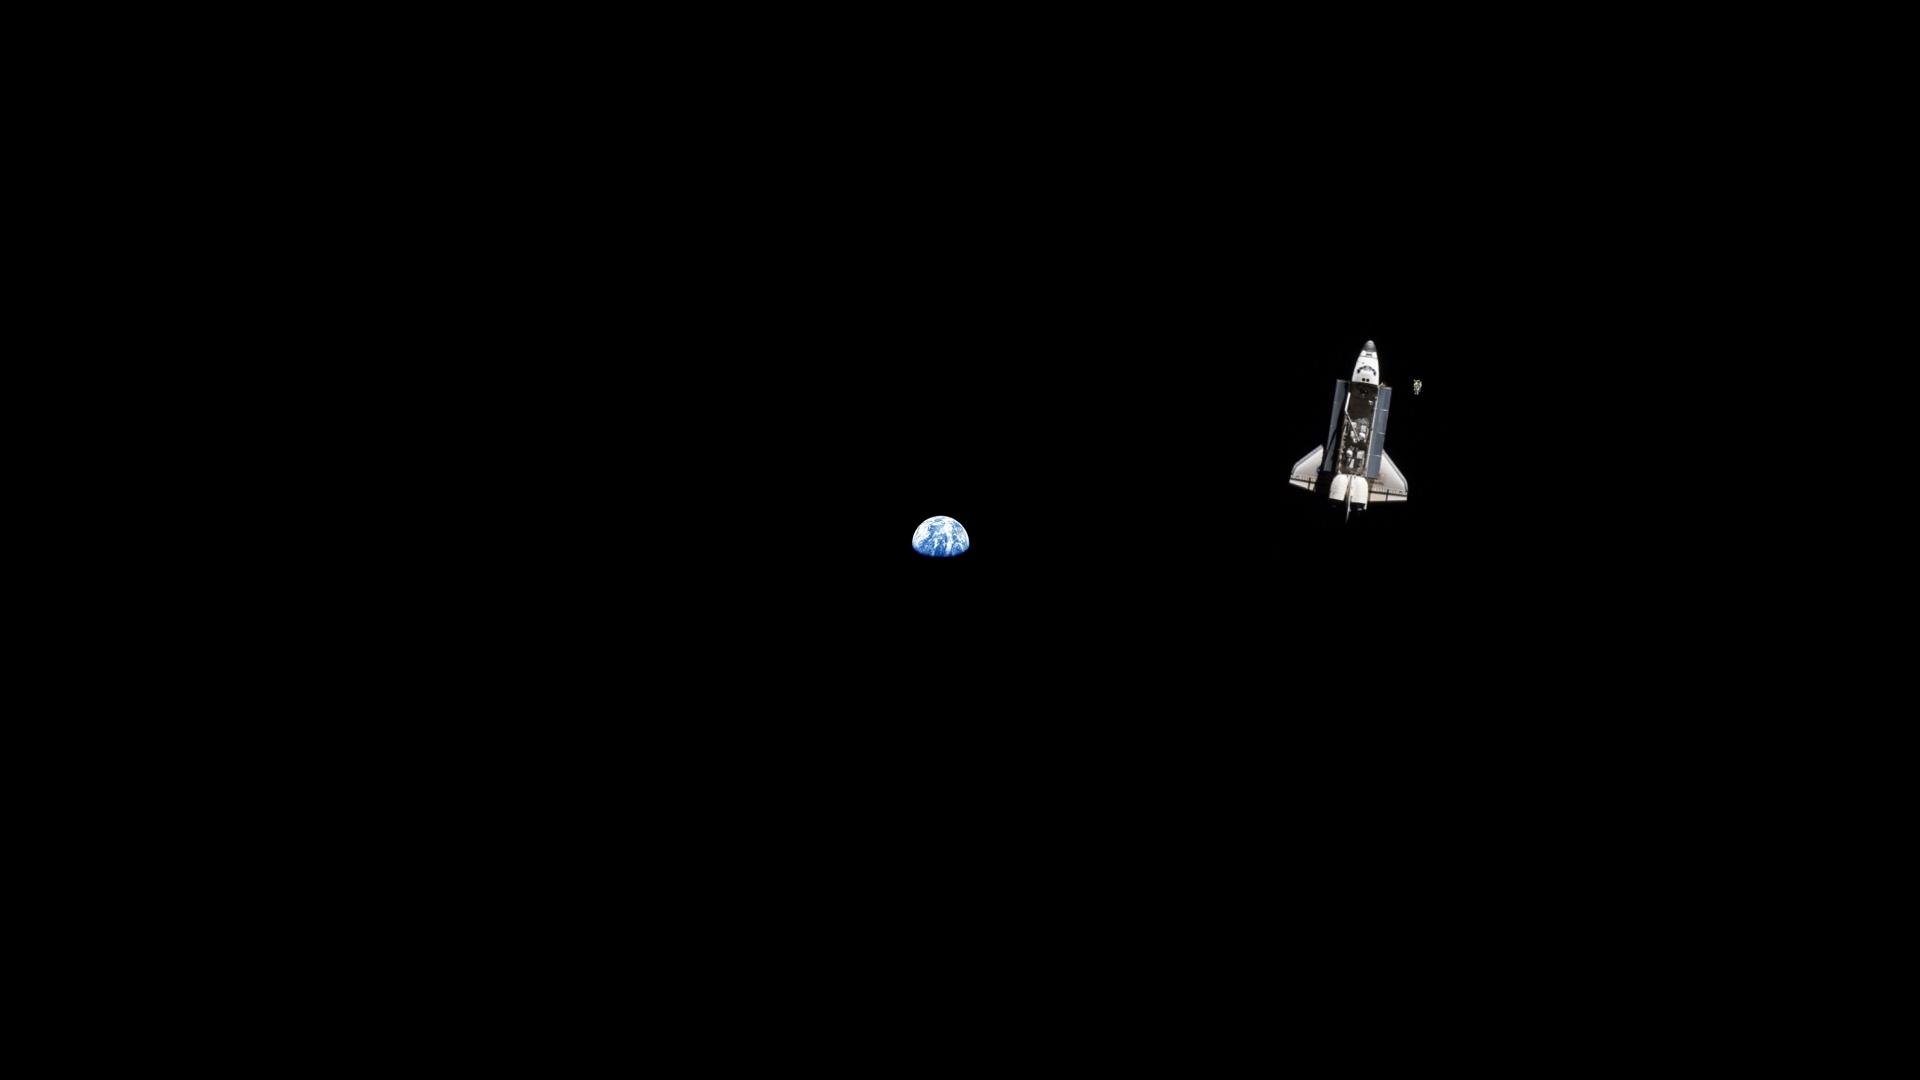 Free Download Black Outer Space Desktop 1920x1080 Wallpaper 345856 1531133 1920x1080 For Your Desktop Mobile Tablet Explore 44 Black Space Wallpaper Interstellar Black Hole Wallpaper Live Black Hole Desktop